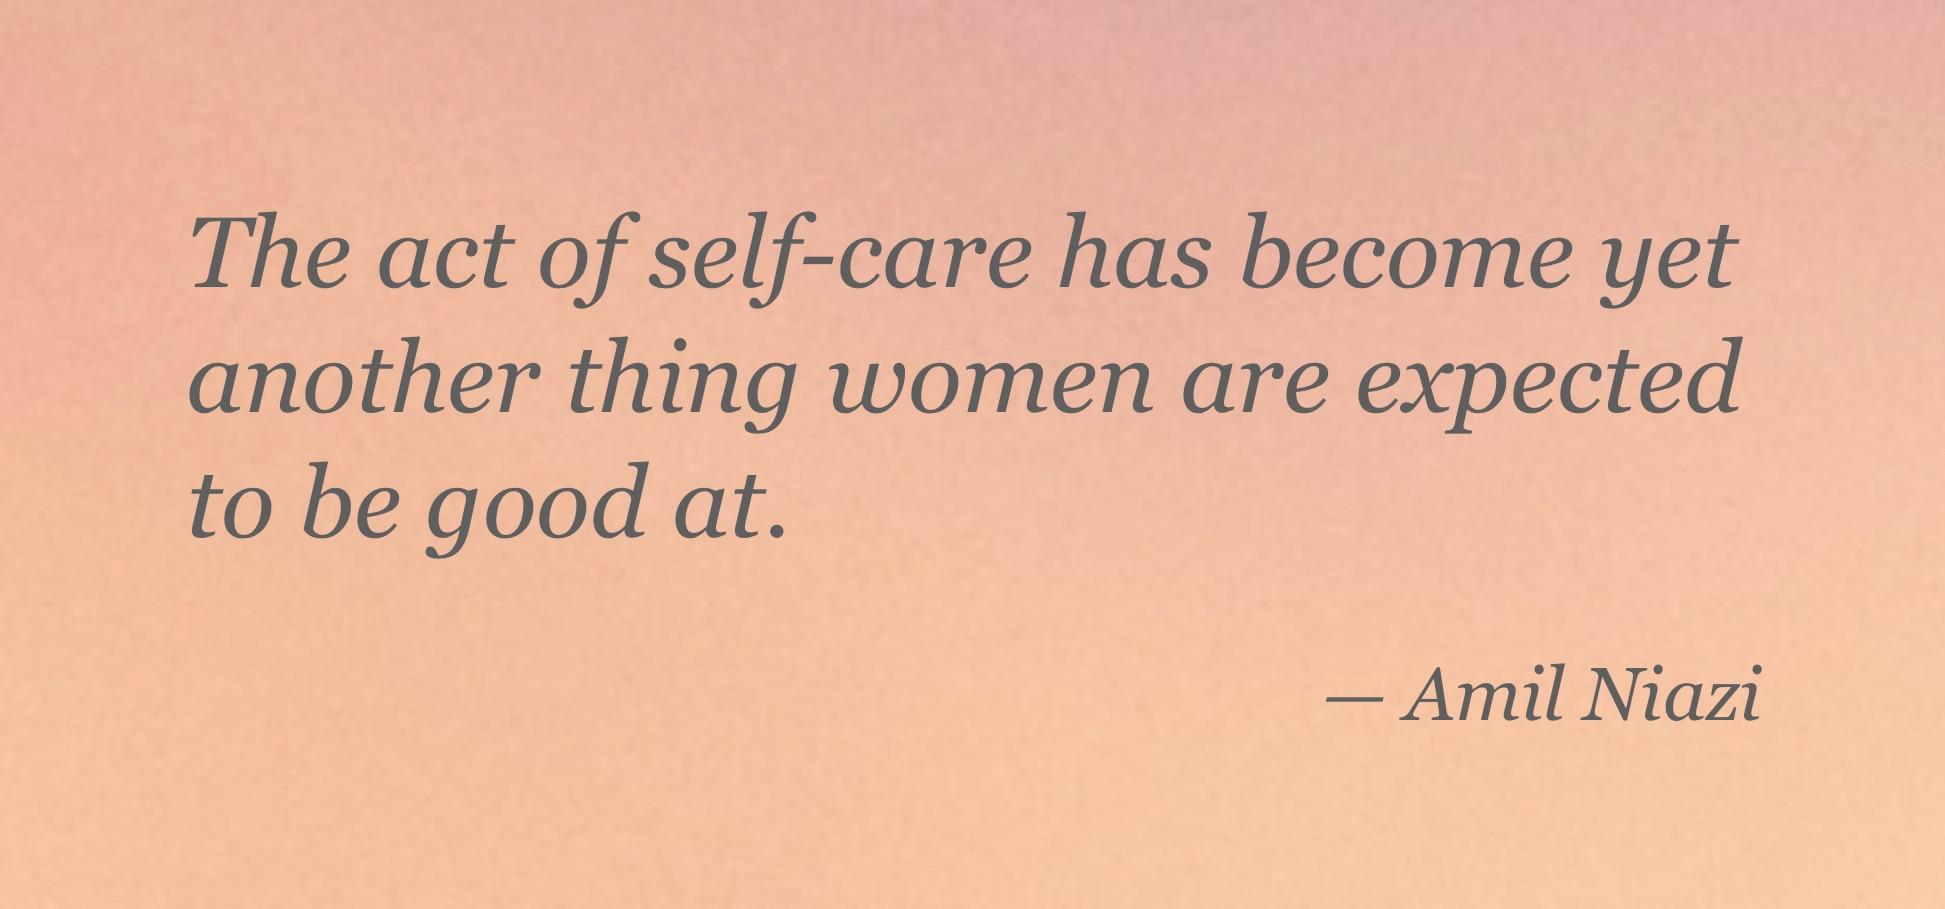 Self care quote copy.jpg